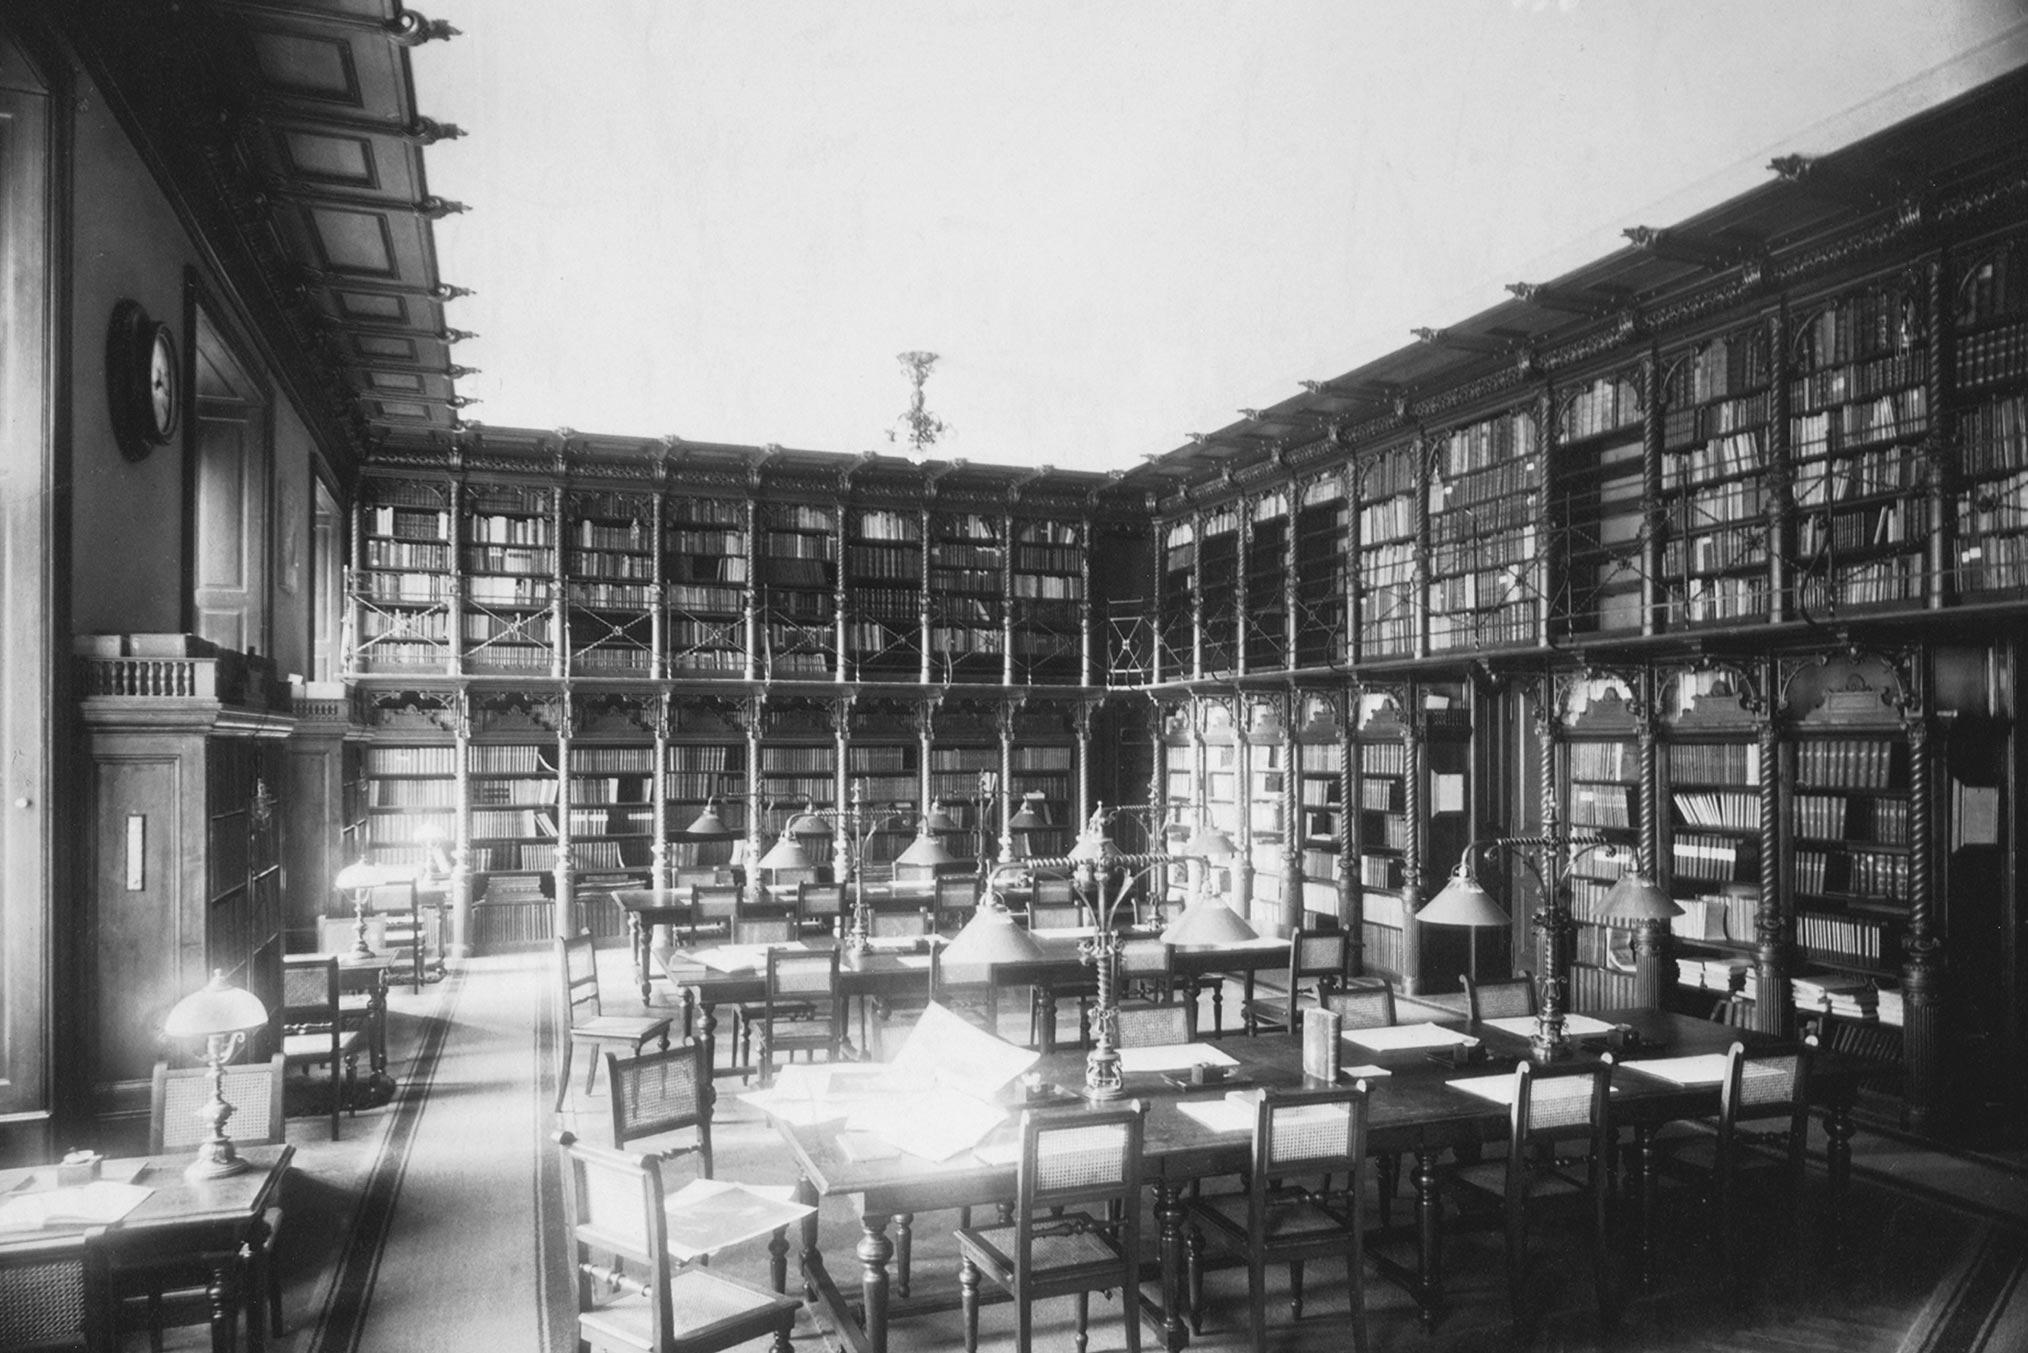 billrothhaus-geschichte-07-grosse-bibliothek-1910